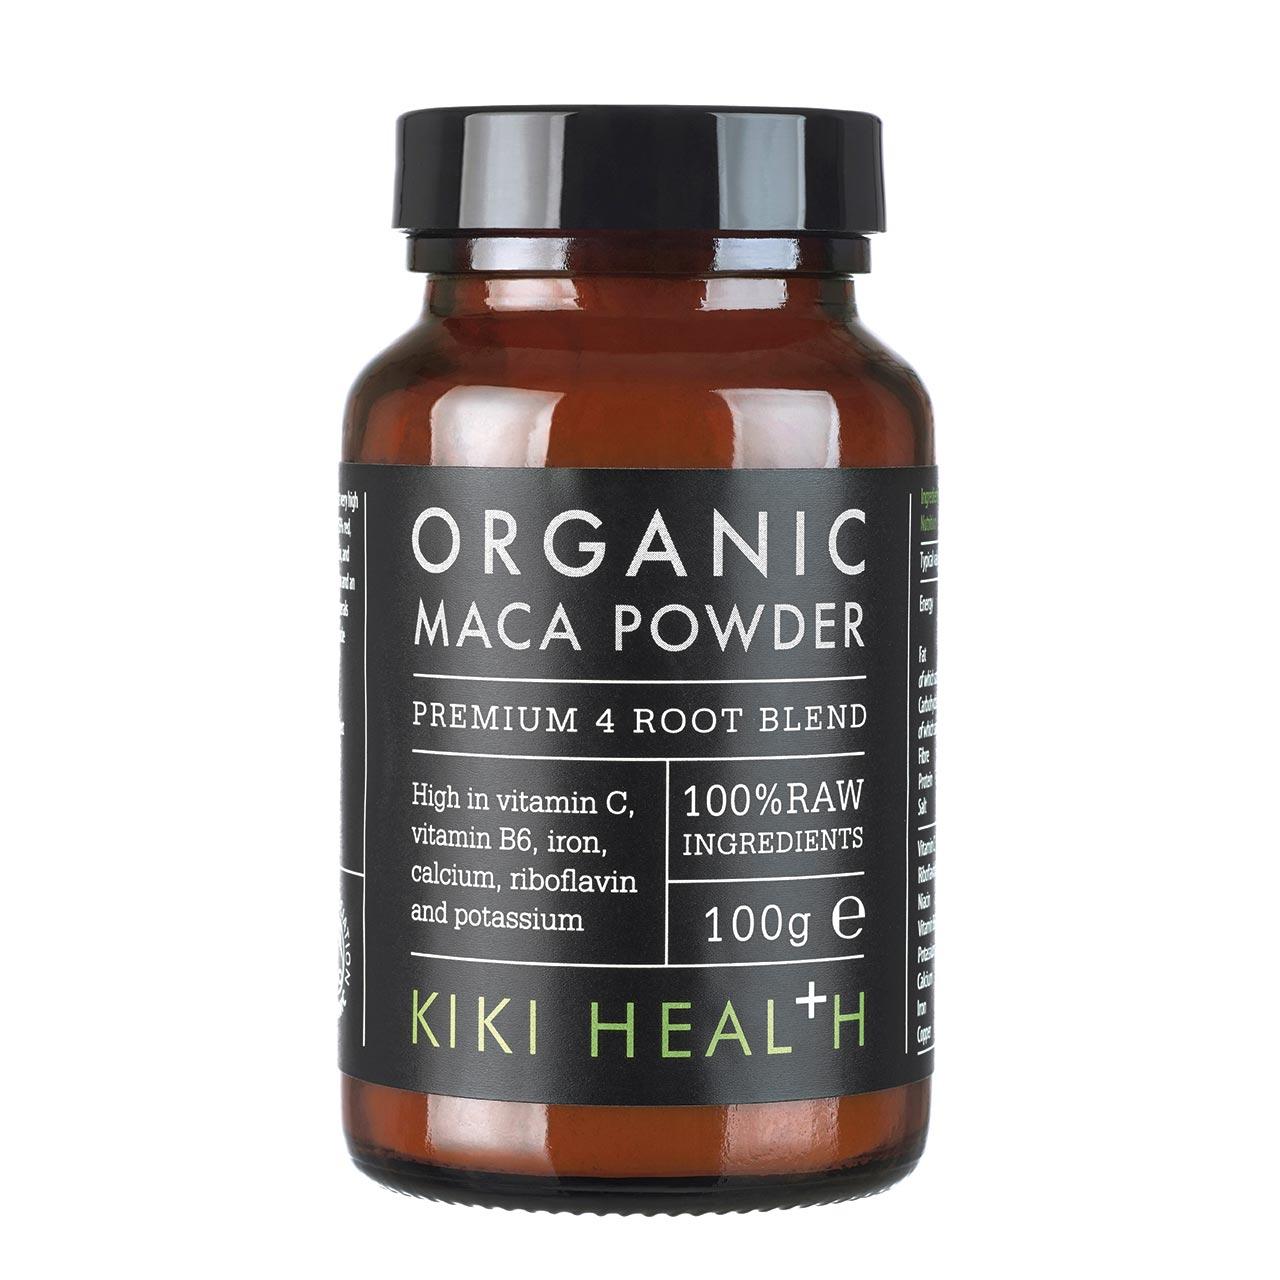 Organic Maca Powder 100g